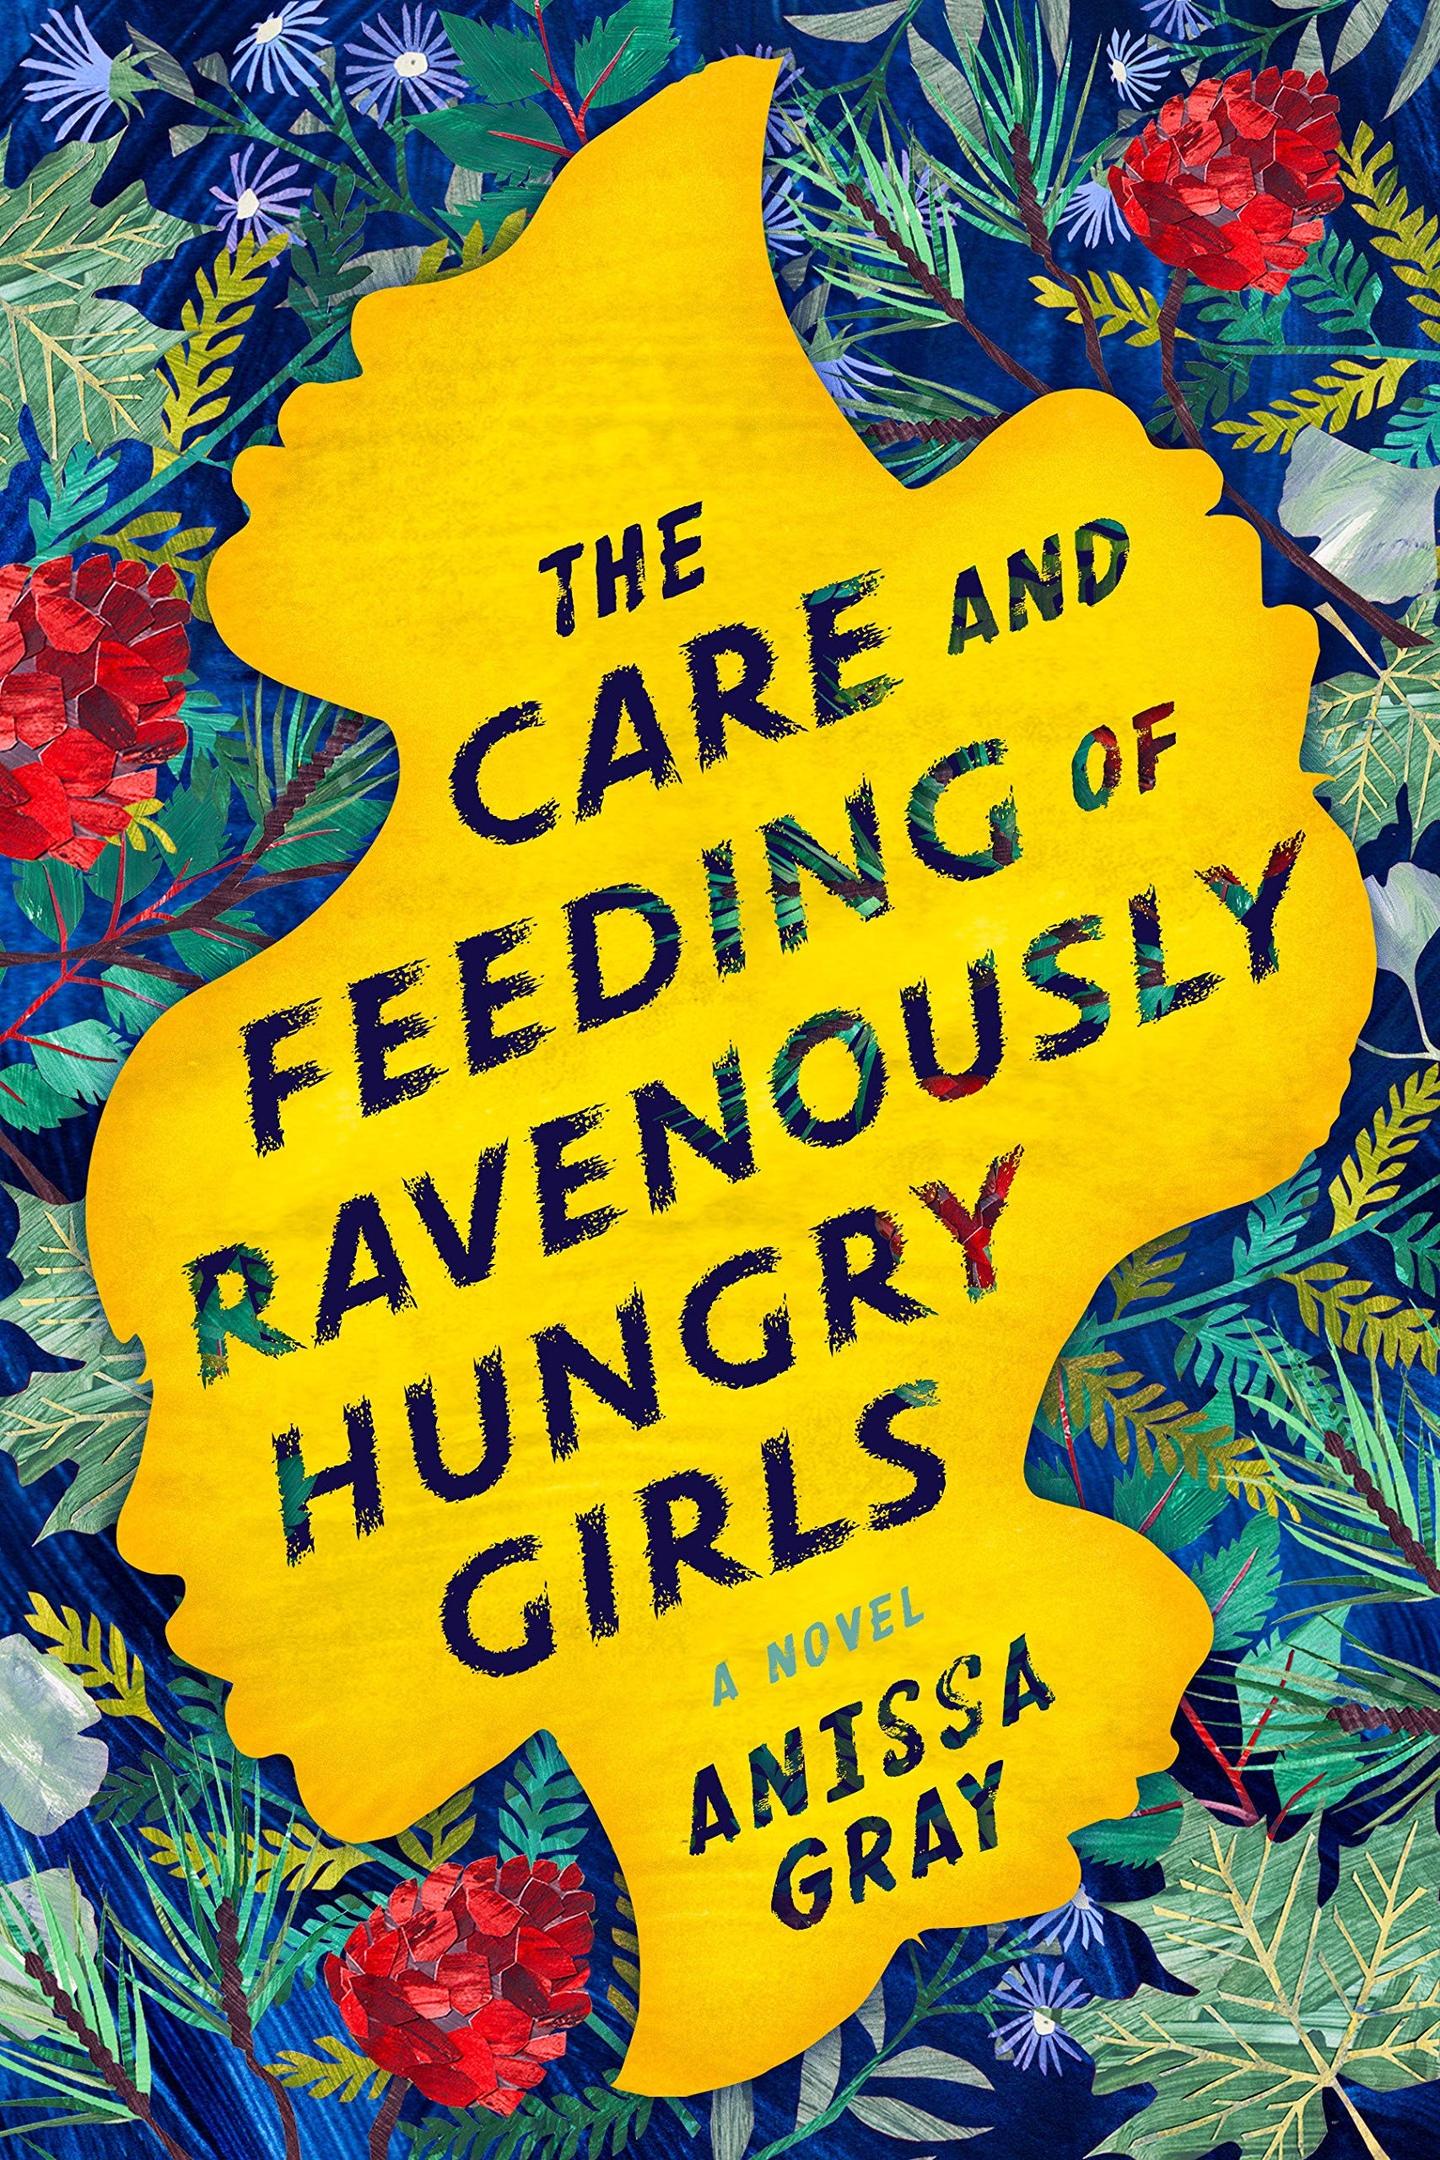 Anissa Gray – The Care And Feeding